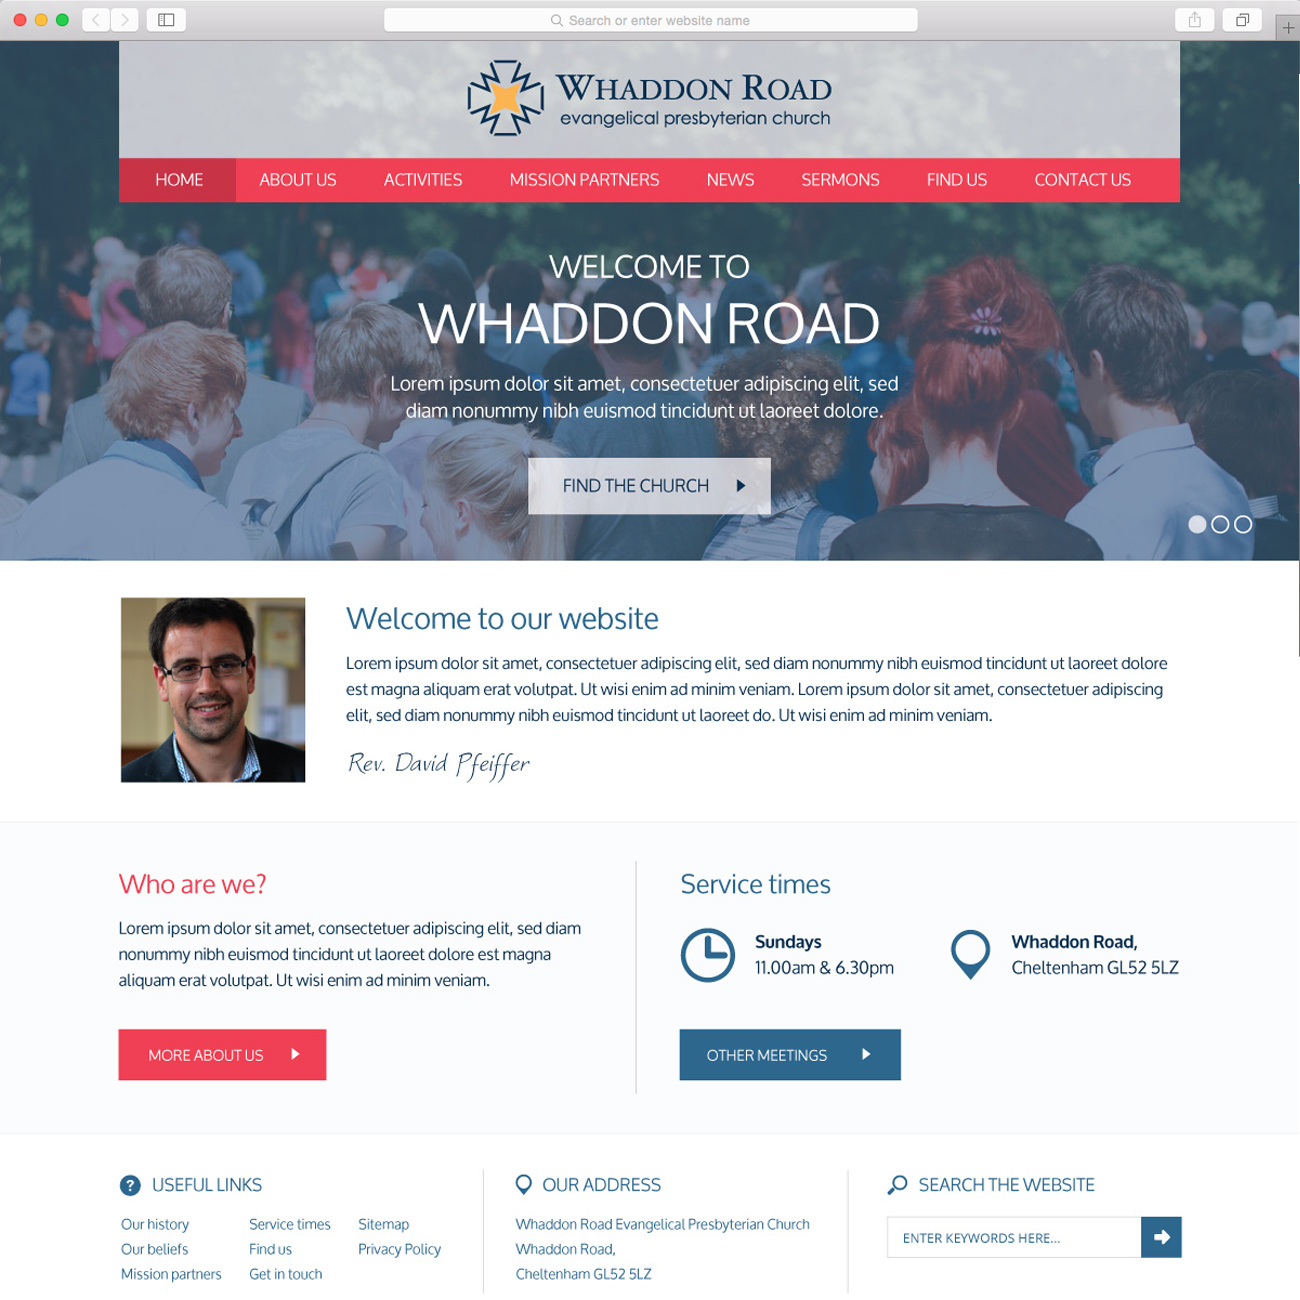 Whaddon Road Evangelical Presbyterian Church